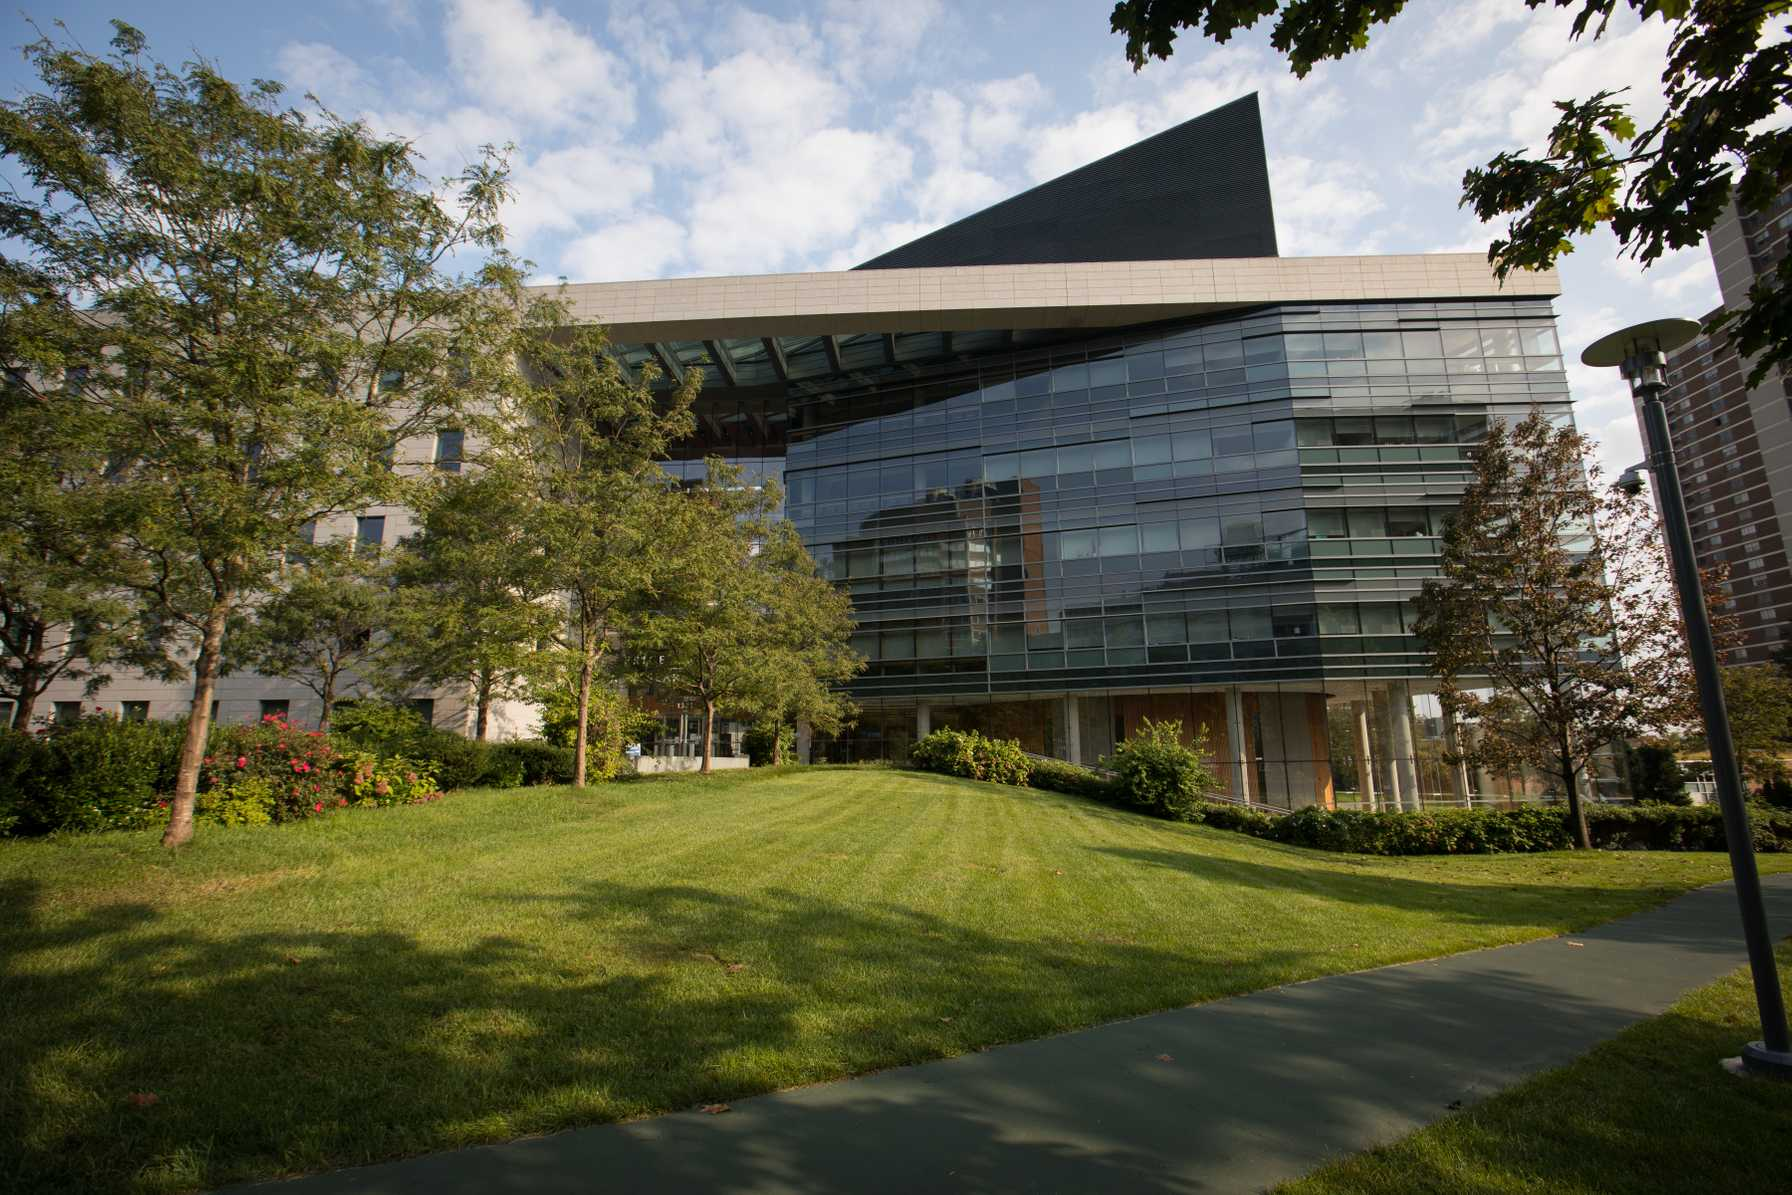 $5.1 million NCI grant awarded to Montefiore Einstein Cancer Center researchers